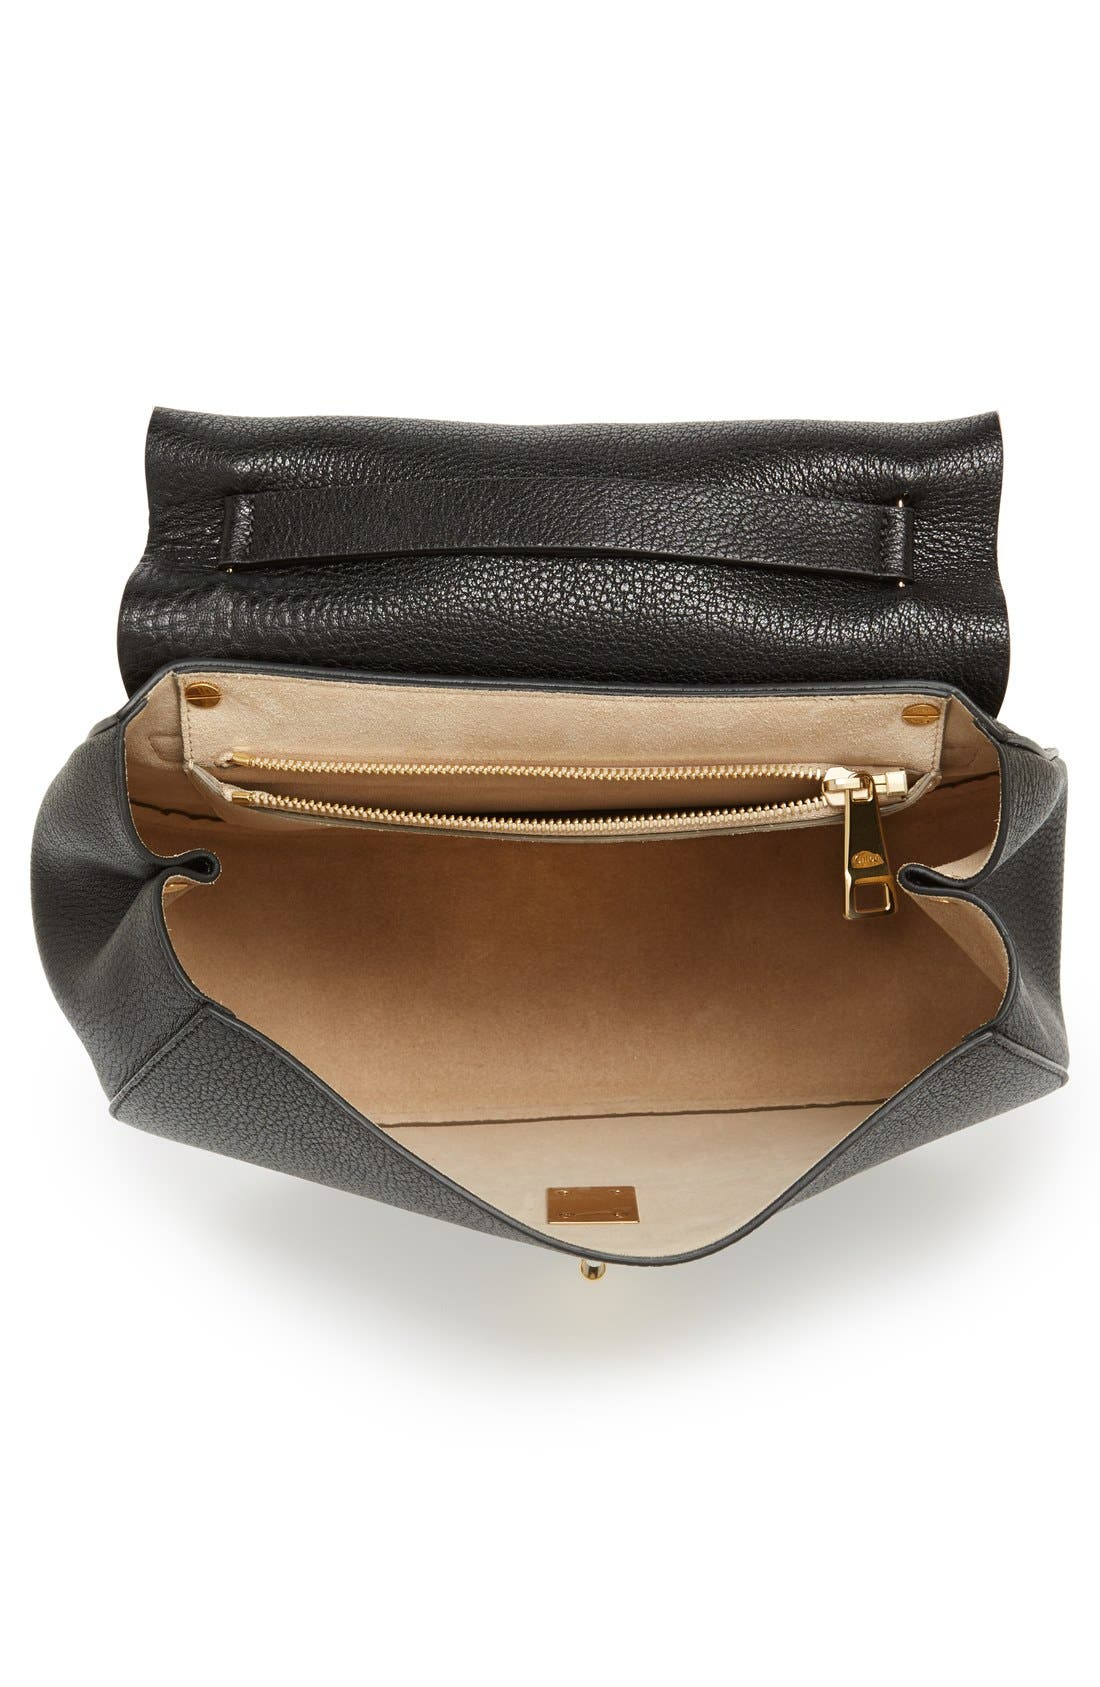 Alternate Image 3  - Chloé 'Drew - Medium' Leather Crossbody Bag